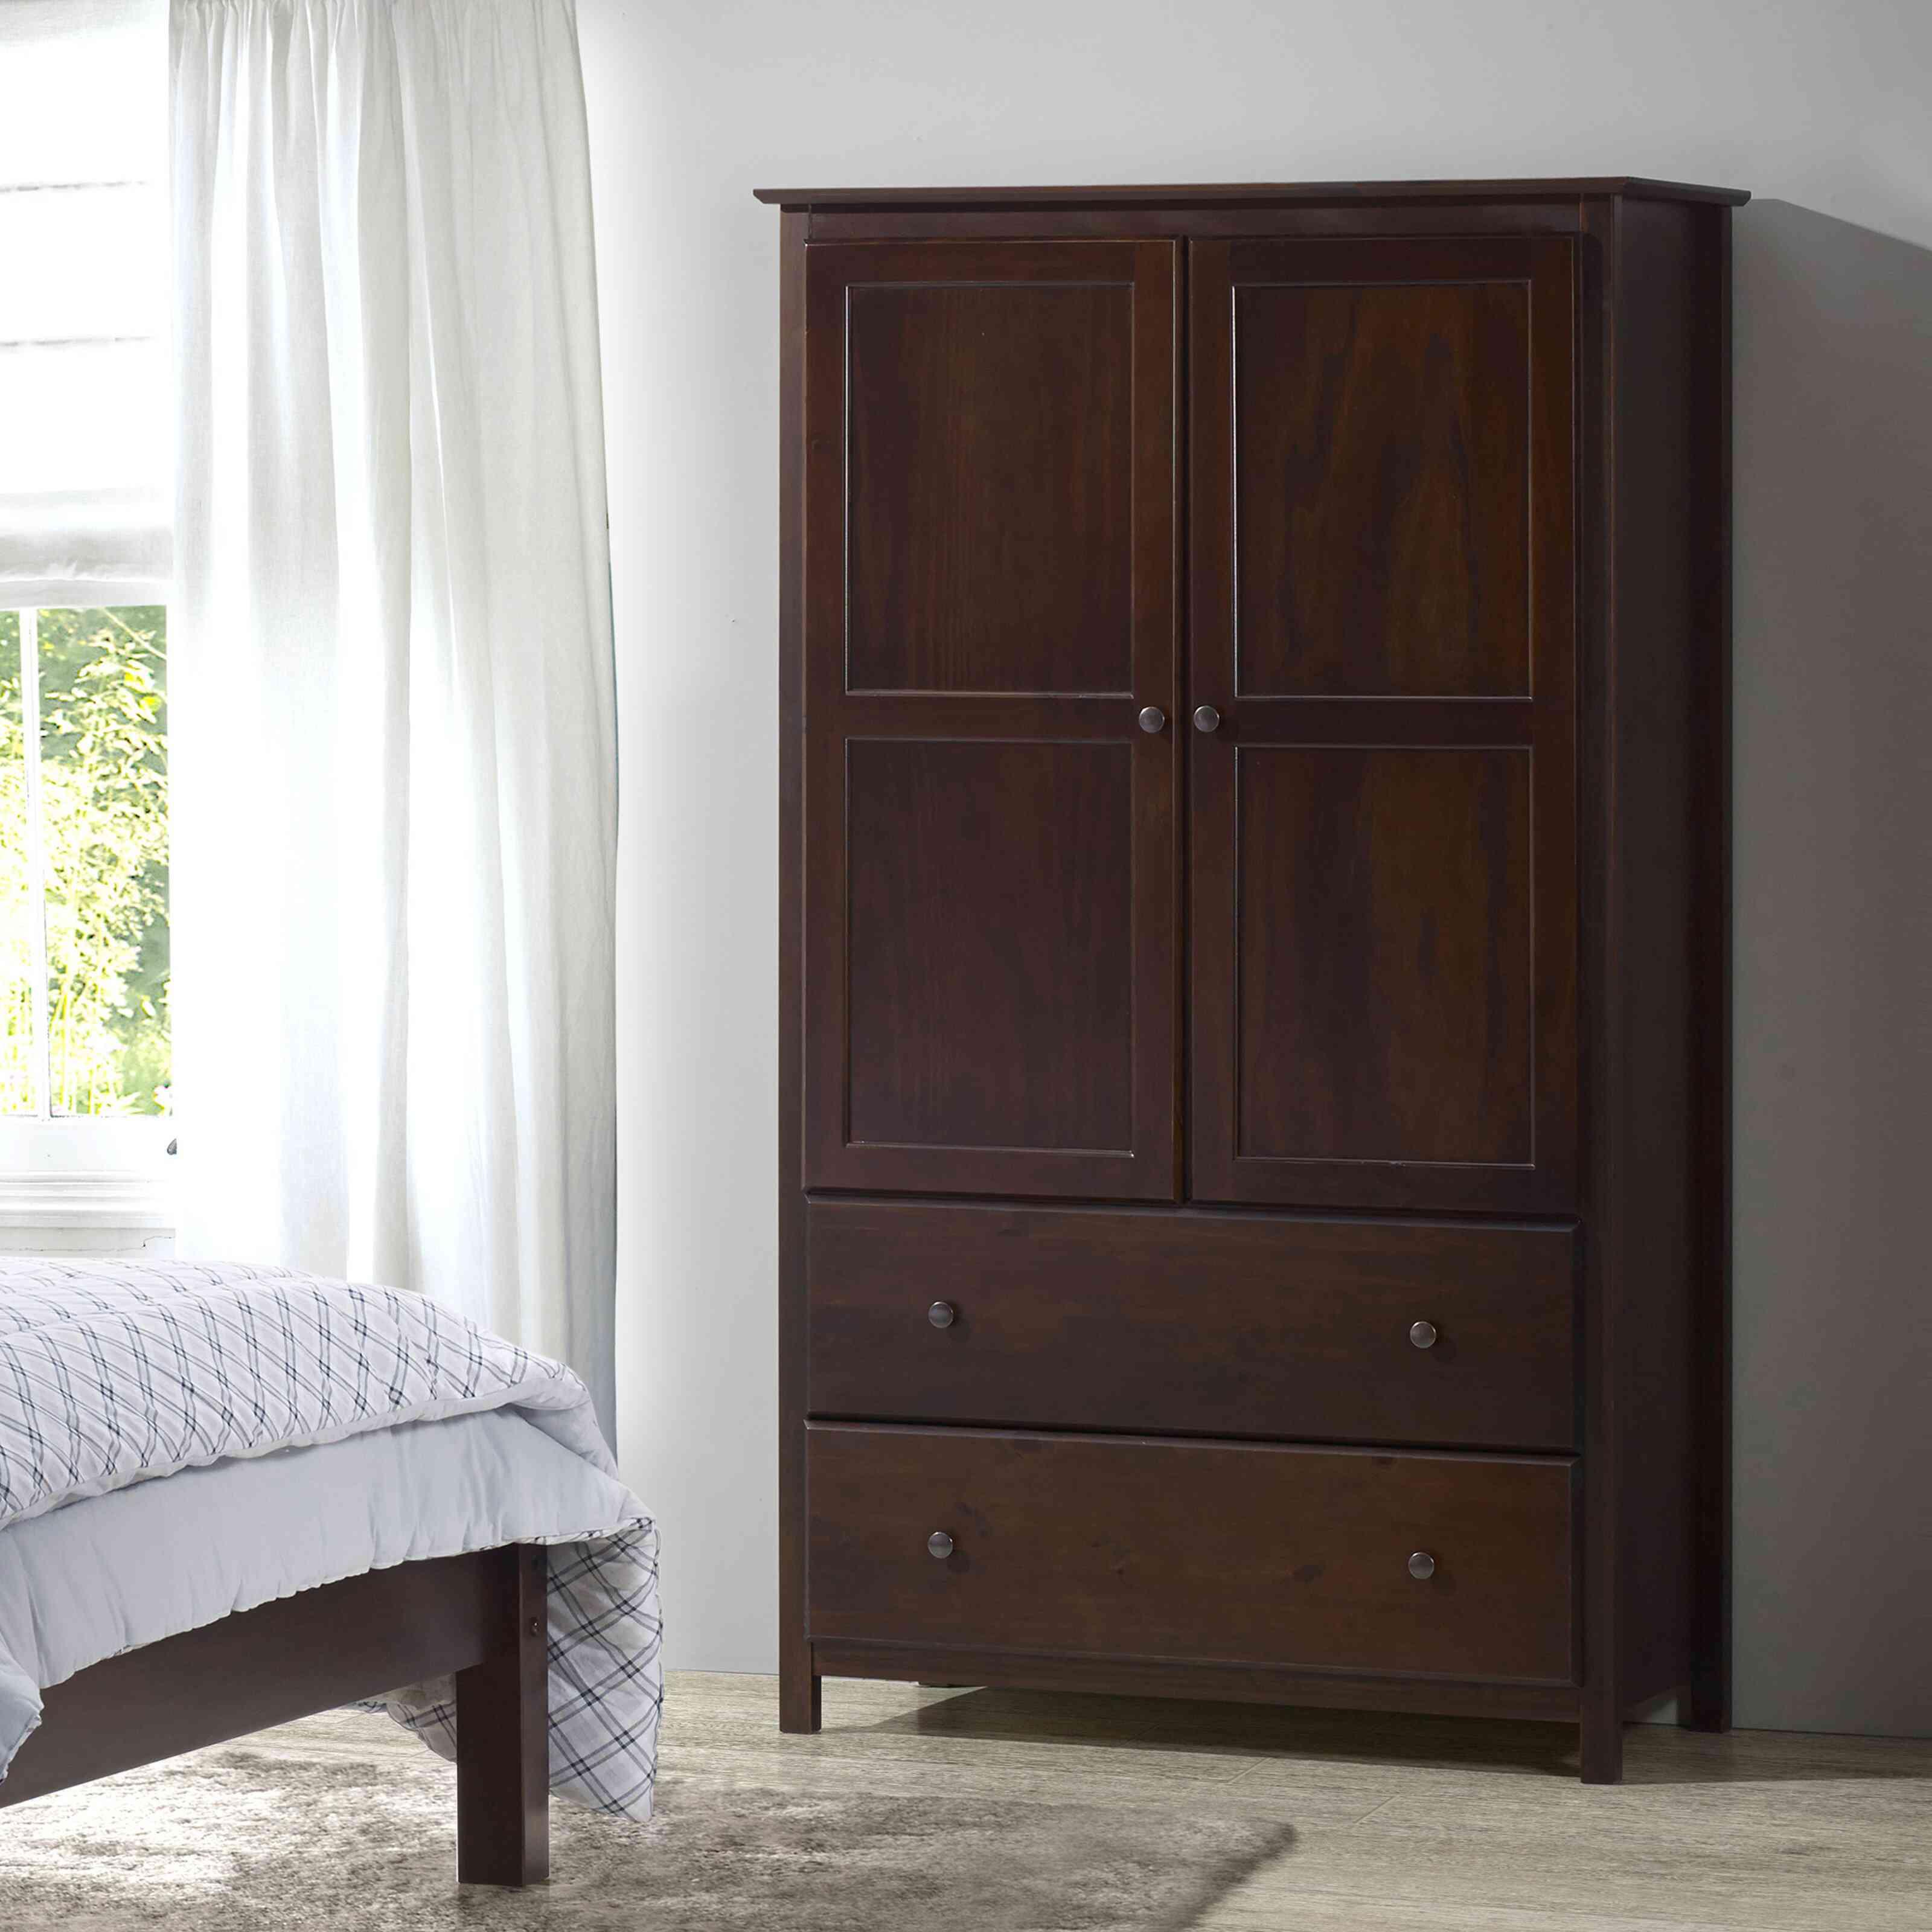 Grain Wood Furniture Shaker Wardrobe Armoire